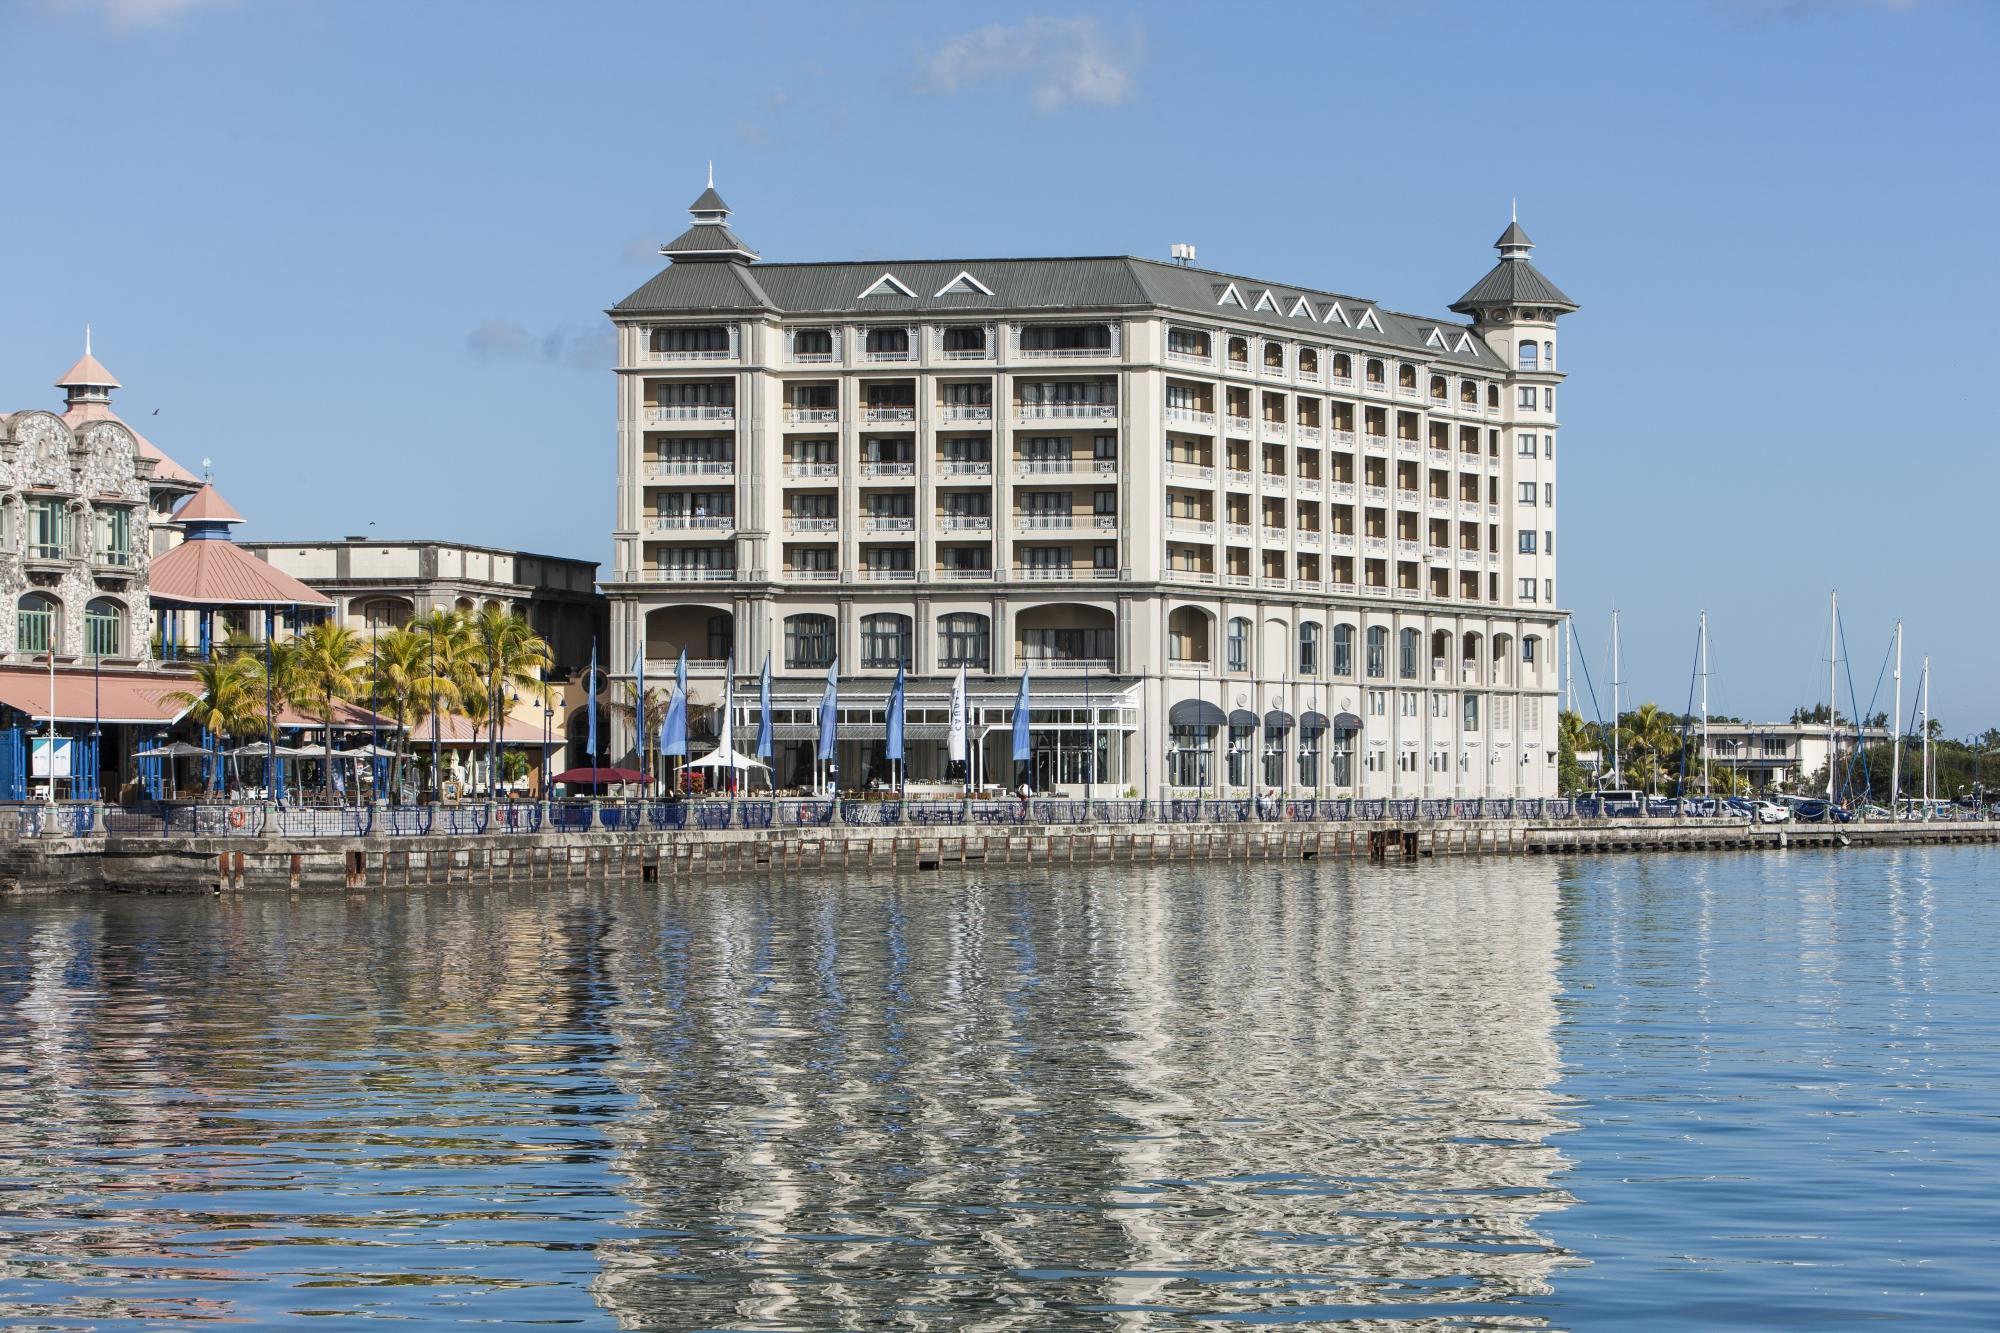 labourdonnais-waterfront-6.jpg